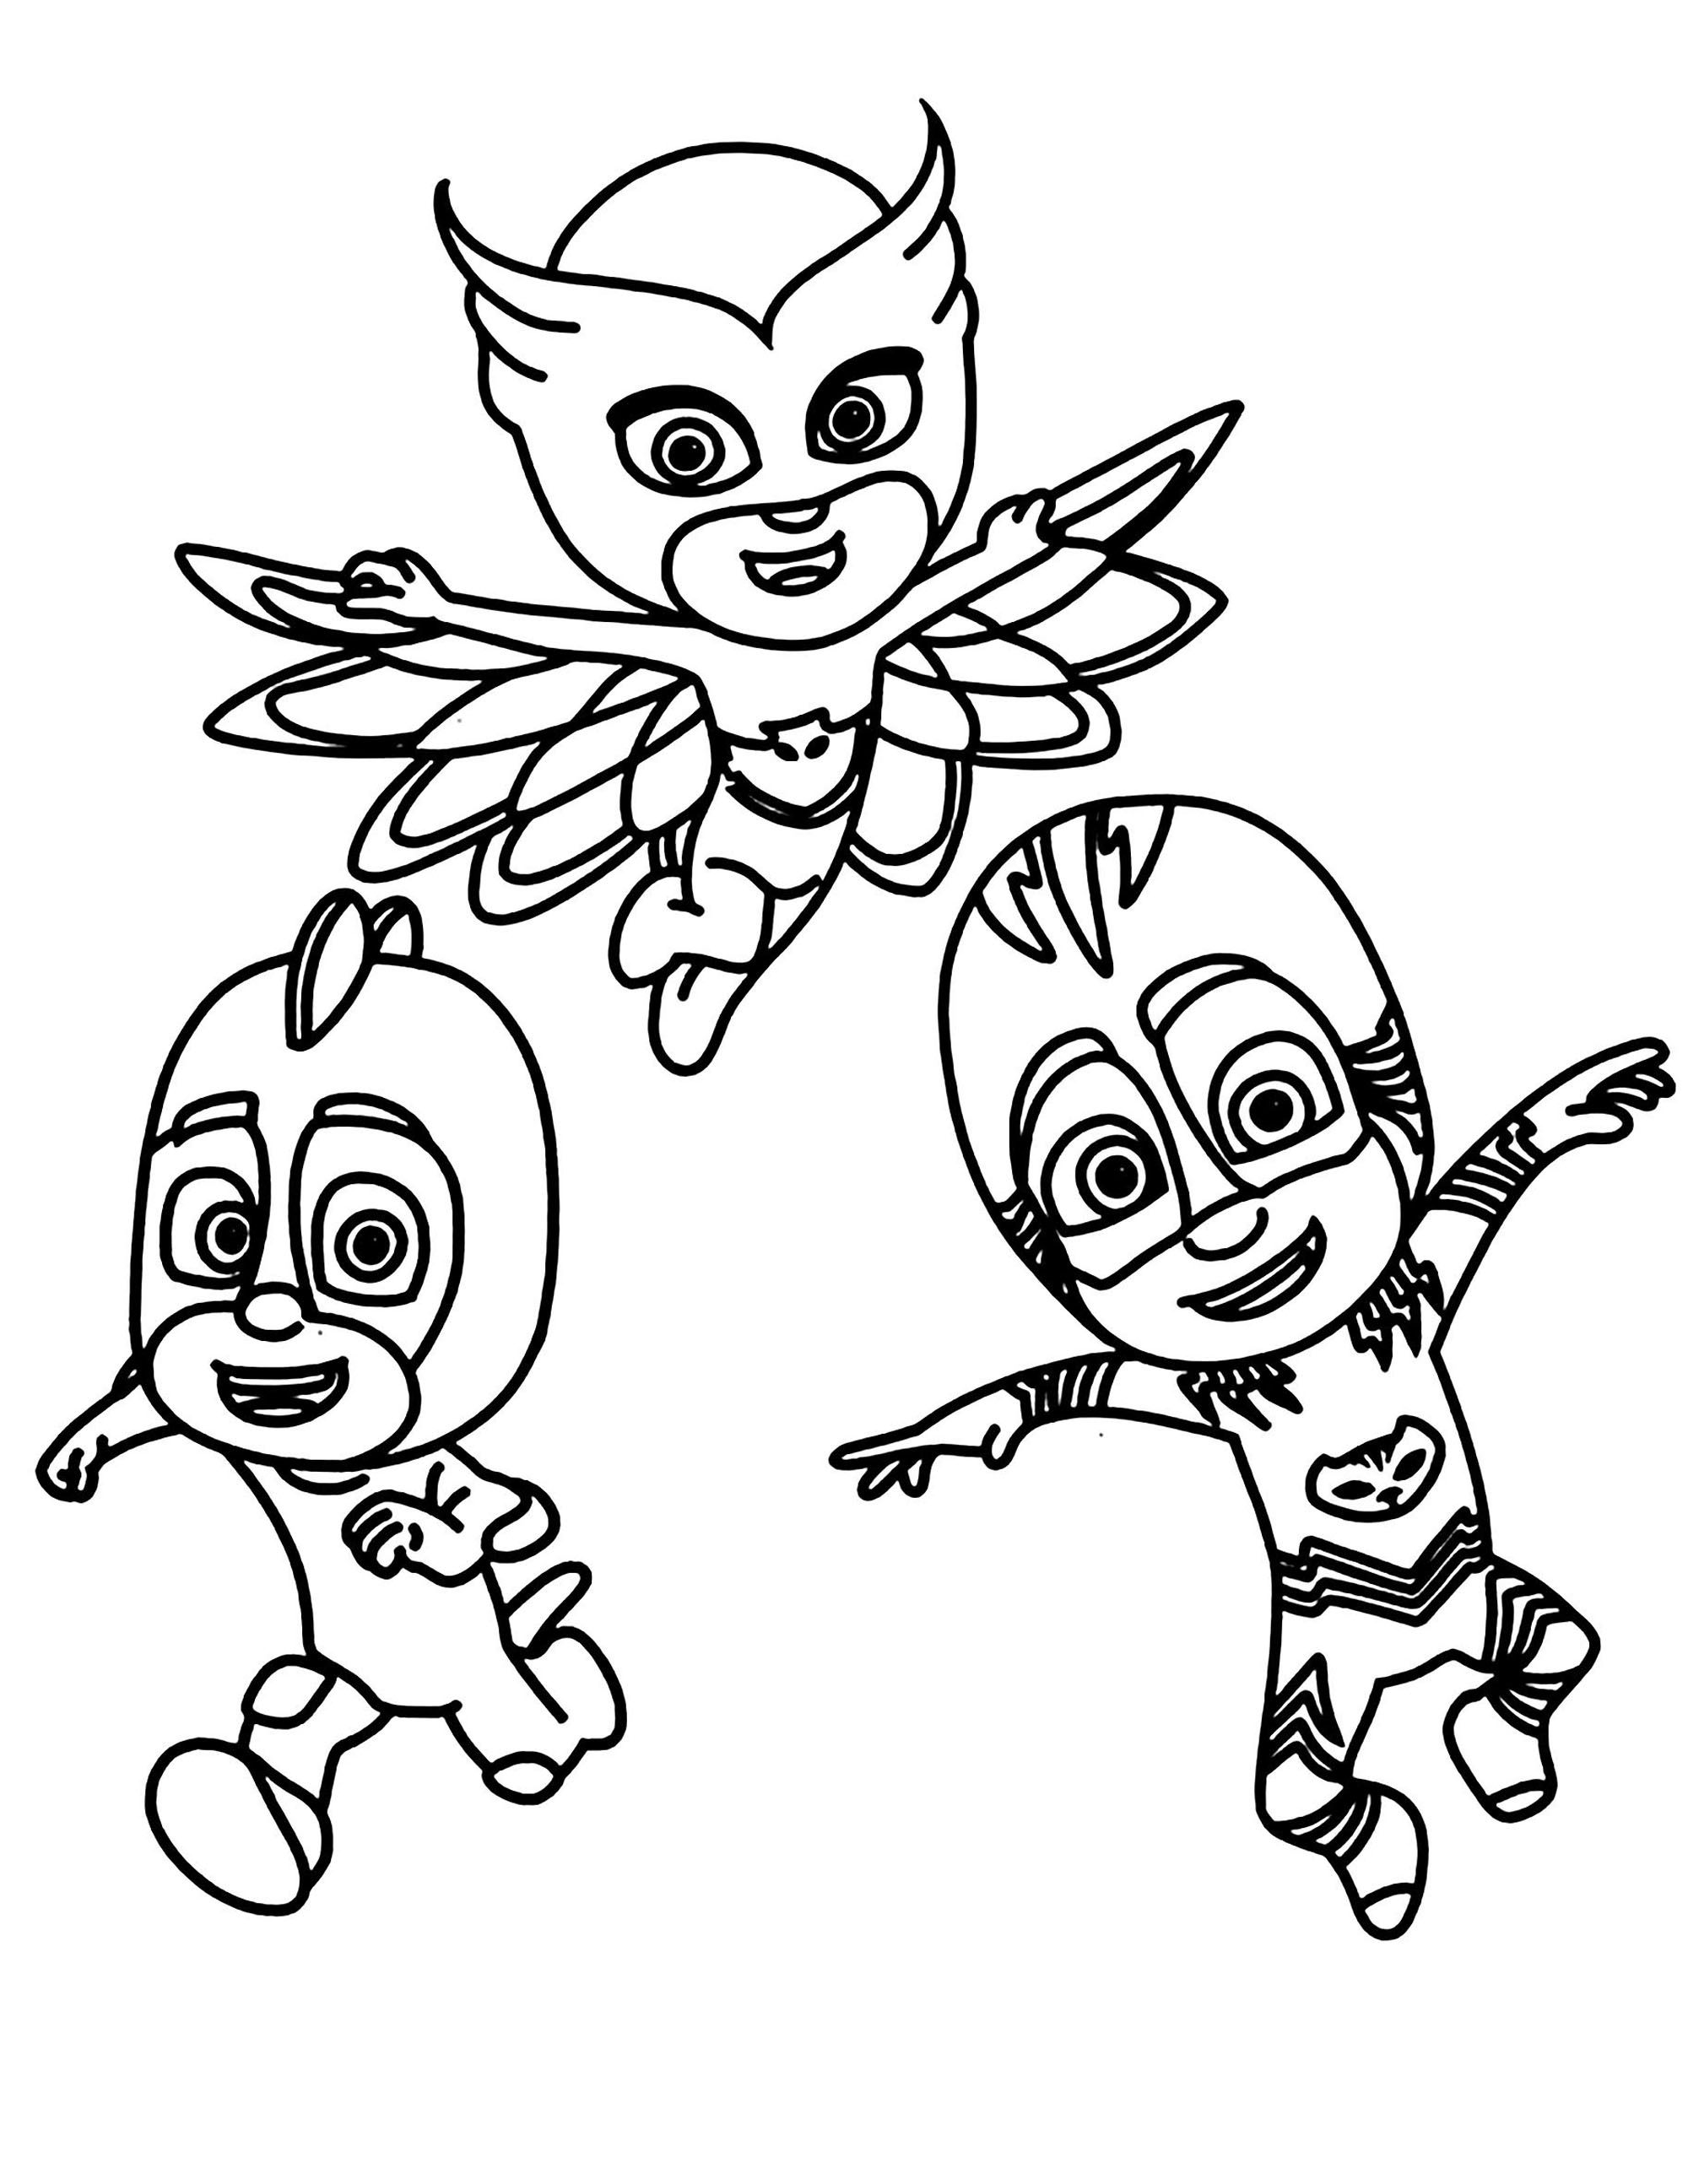 PJ Masks coloring page to print and color Pj masks